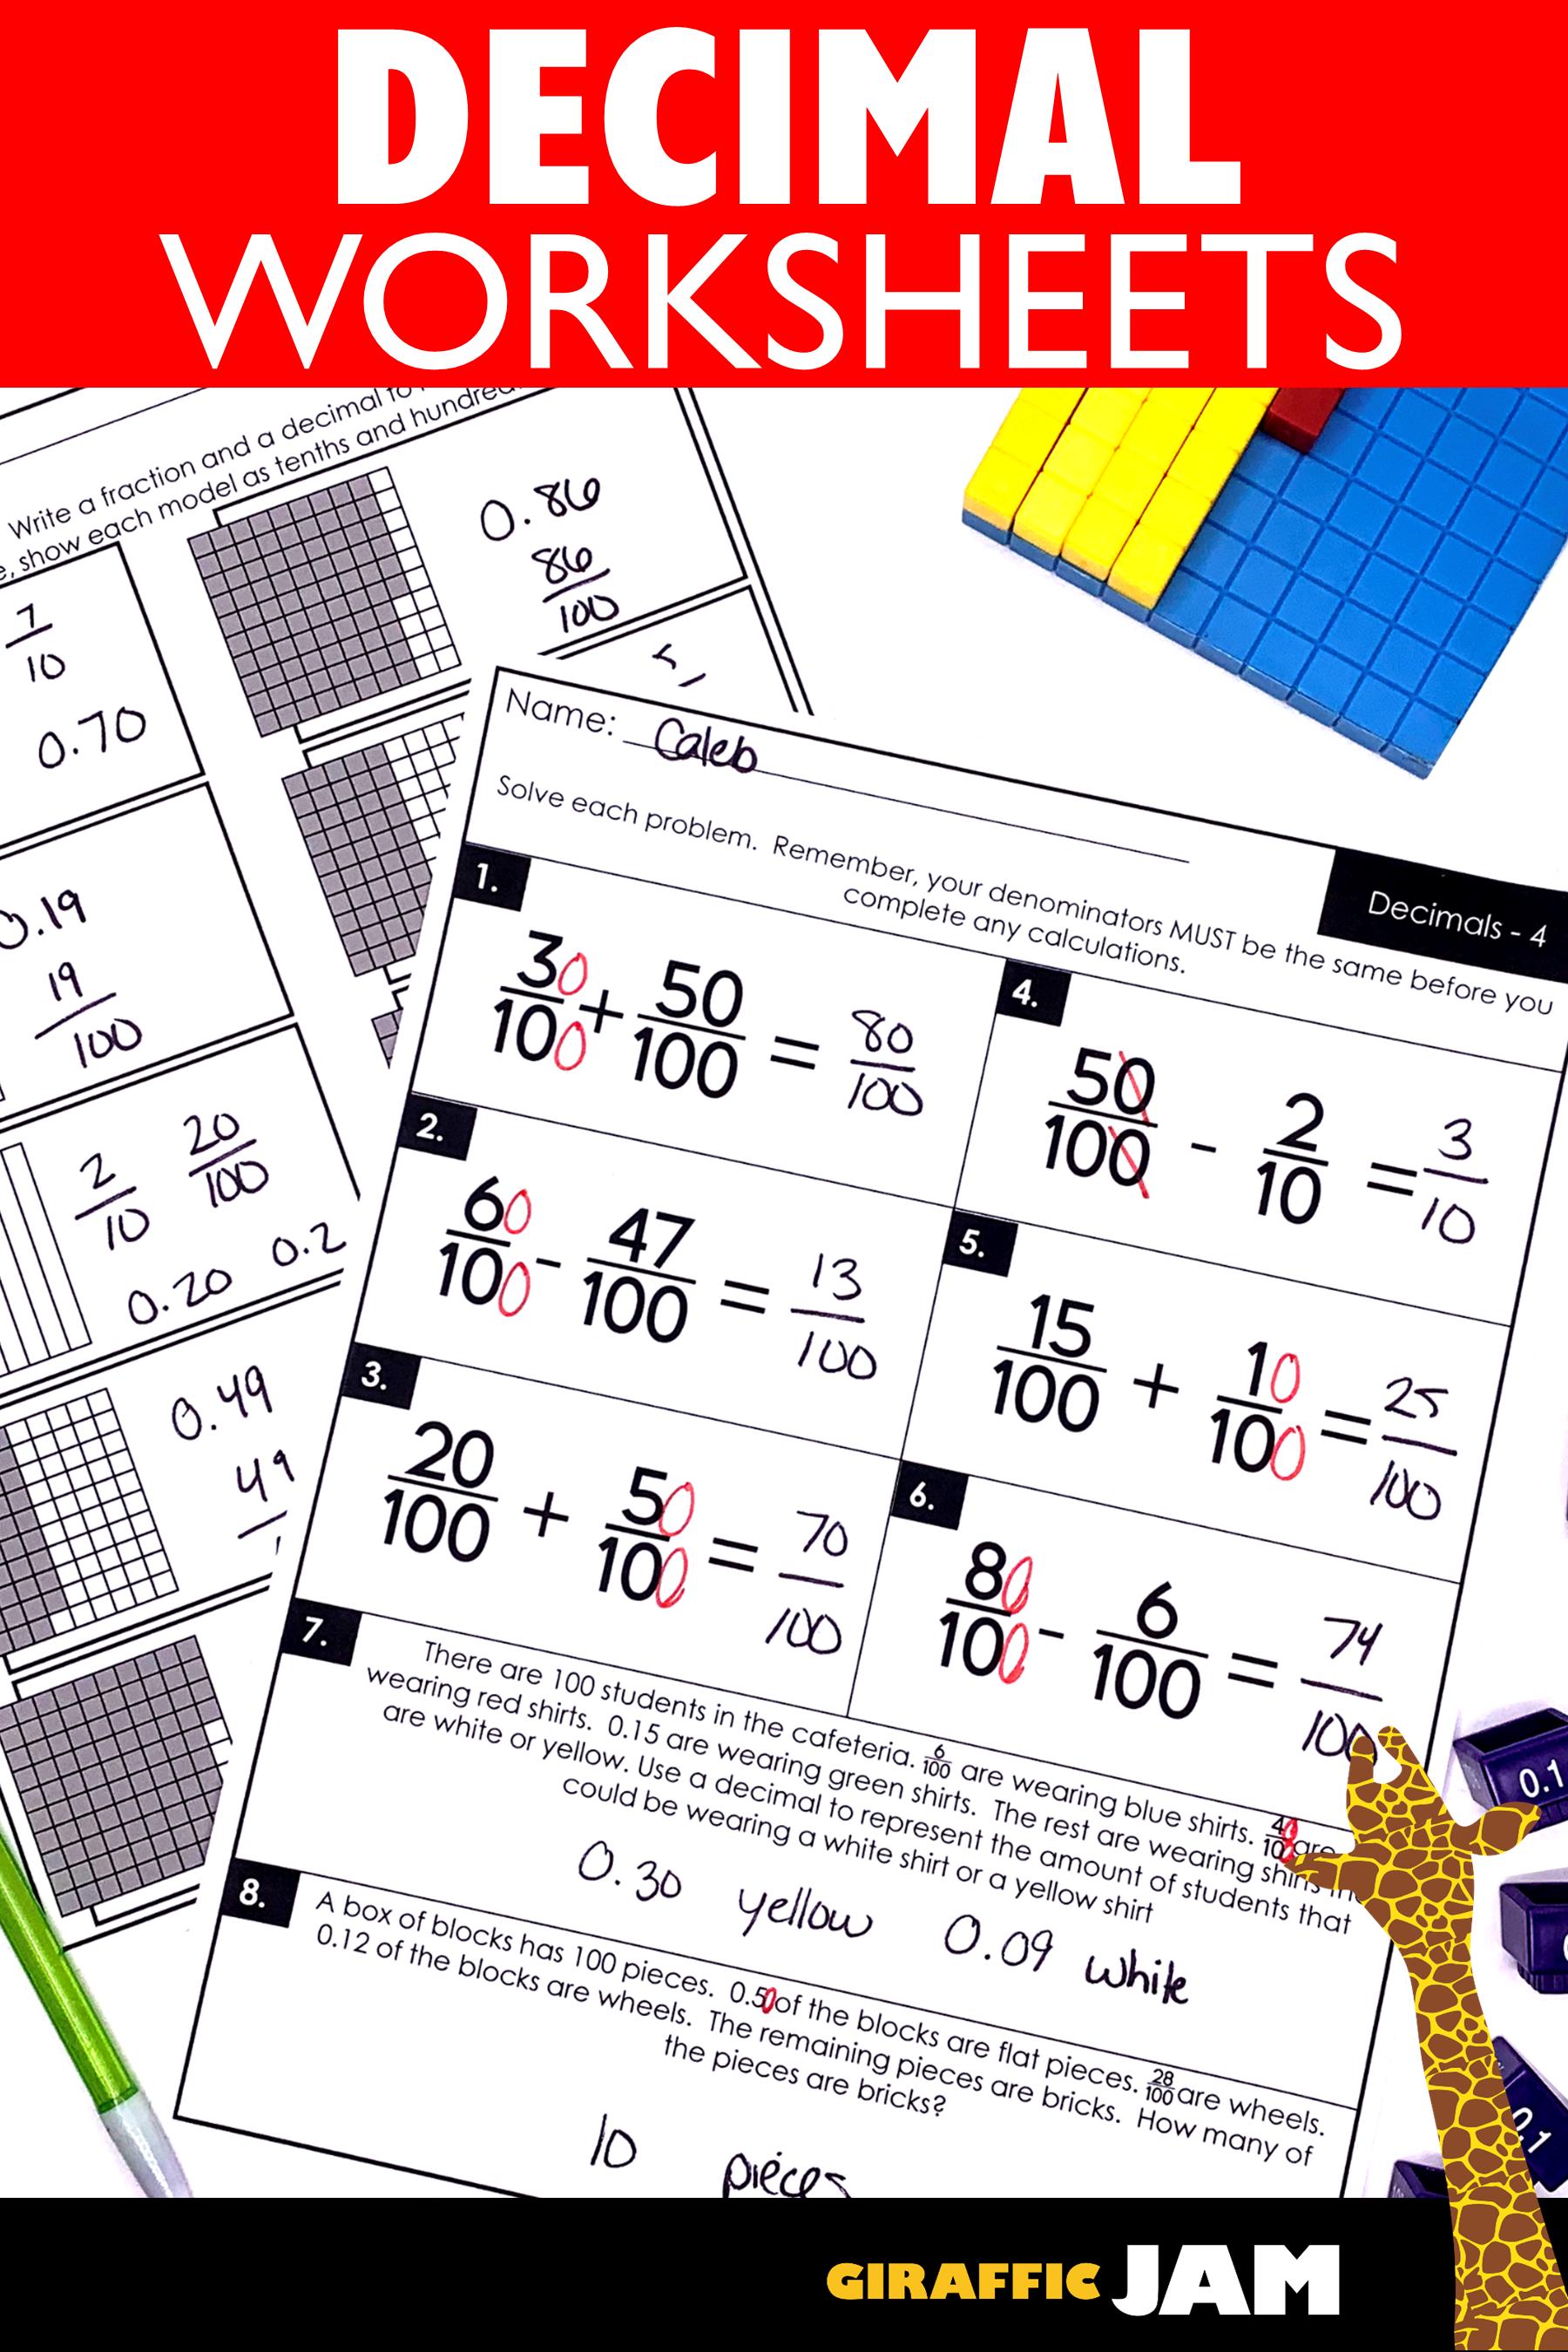 4th Grade Fractions Decimals Fraction Worksheets 4th Grade Math Worksheets Fraction Homework Fractions Worksheets Decimals Worksheets Fraction Homework